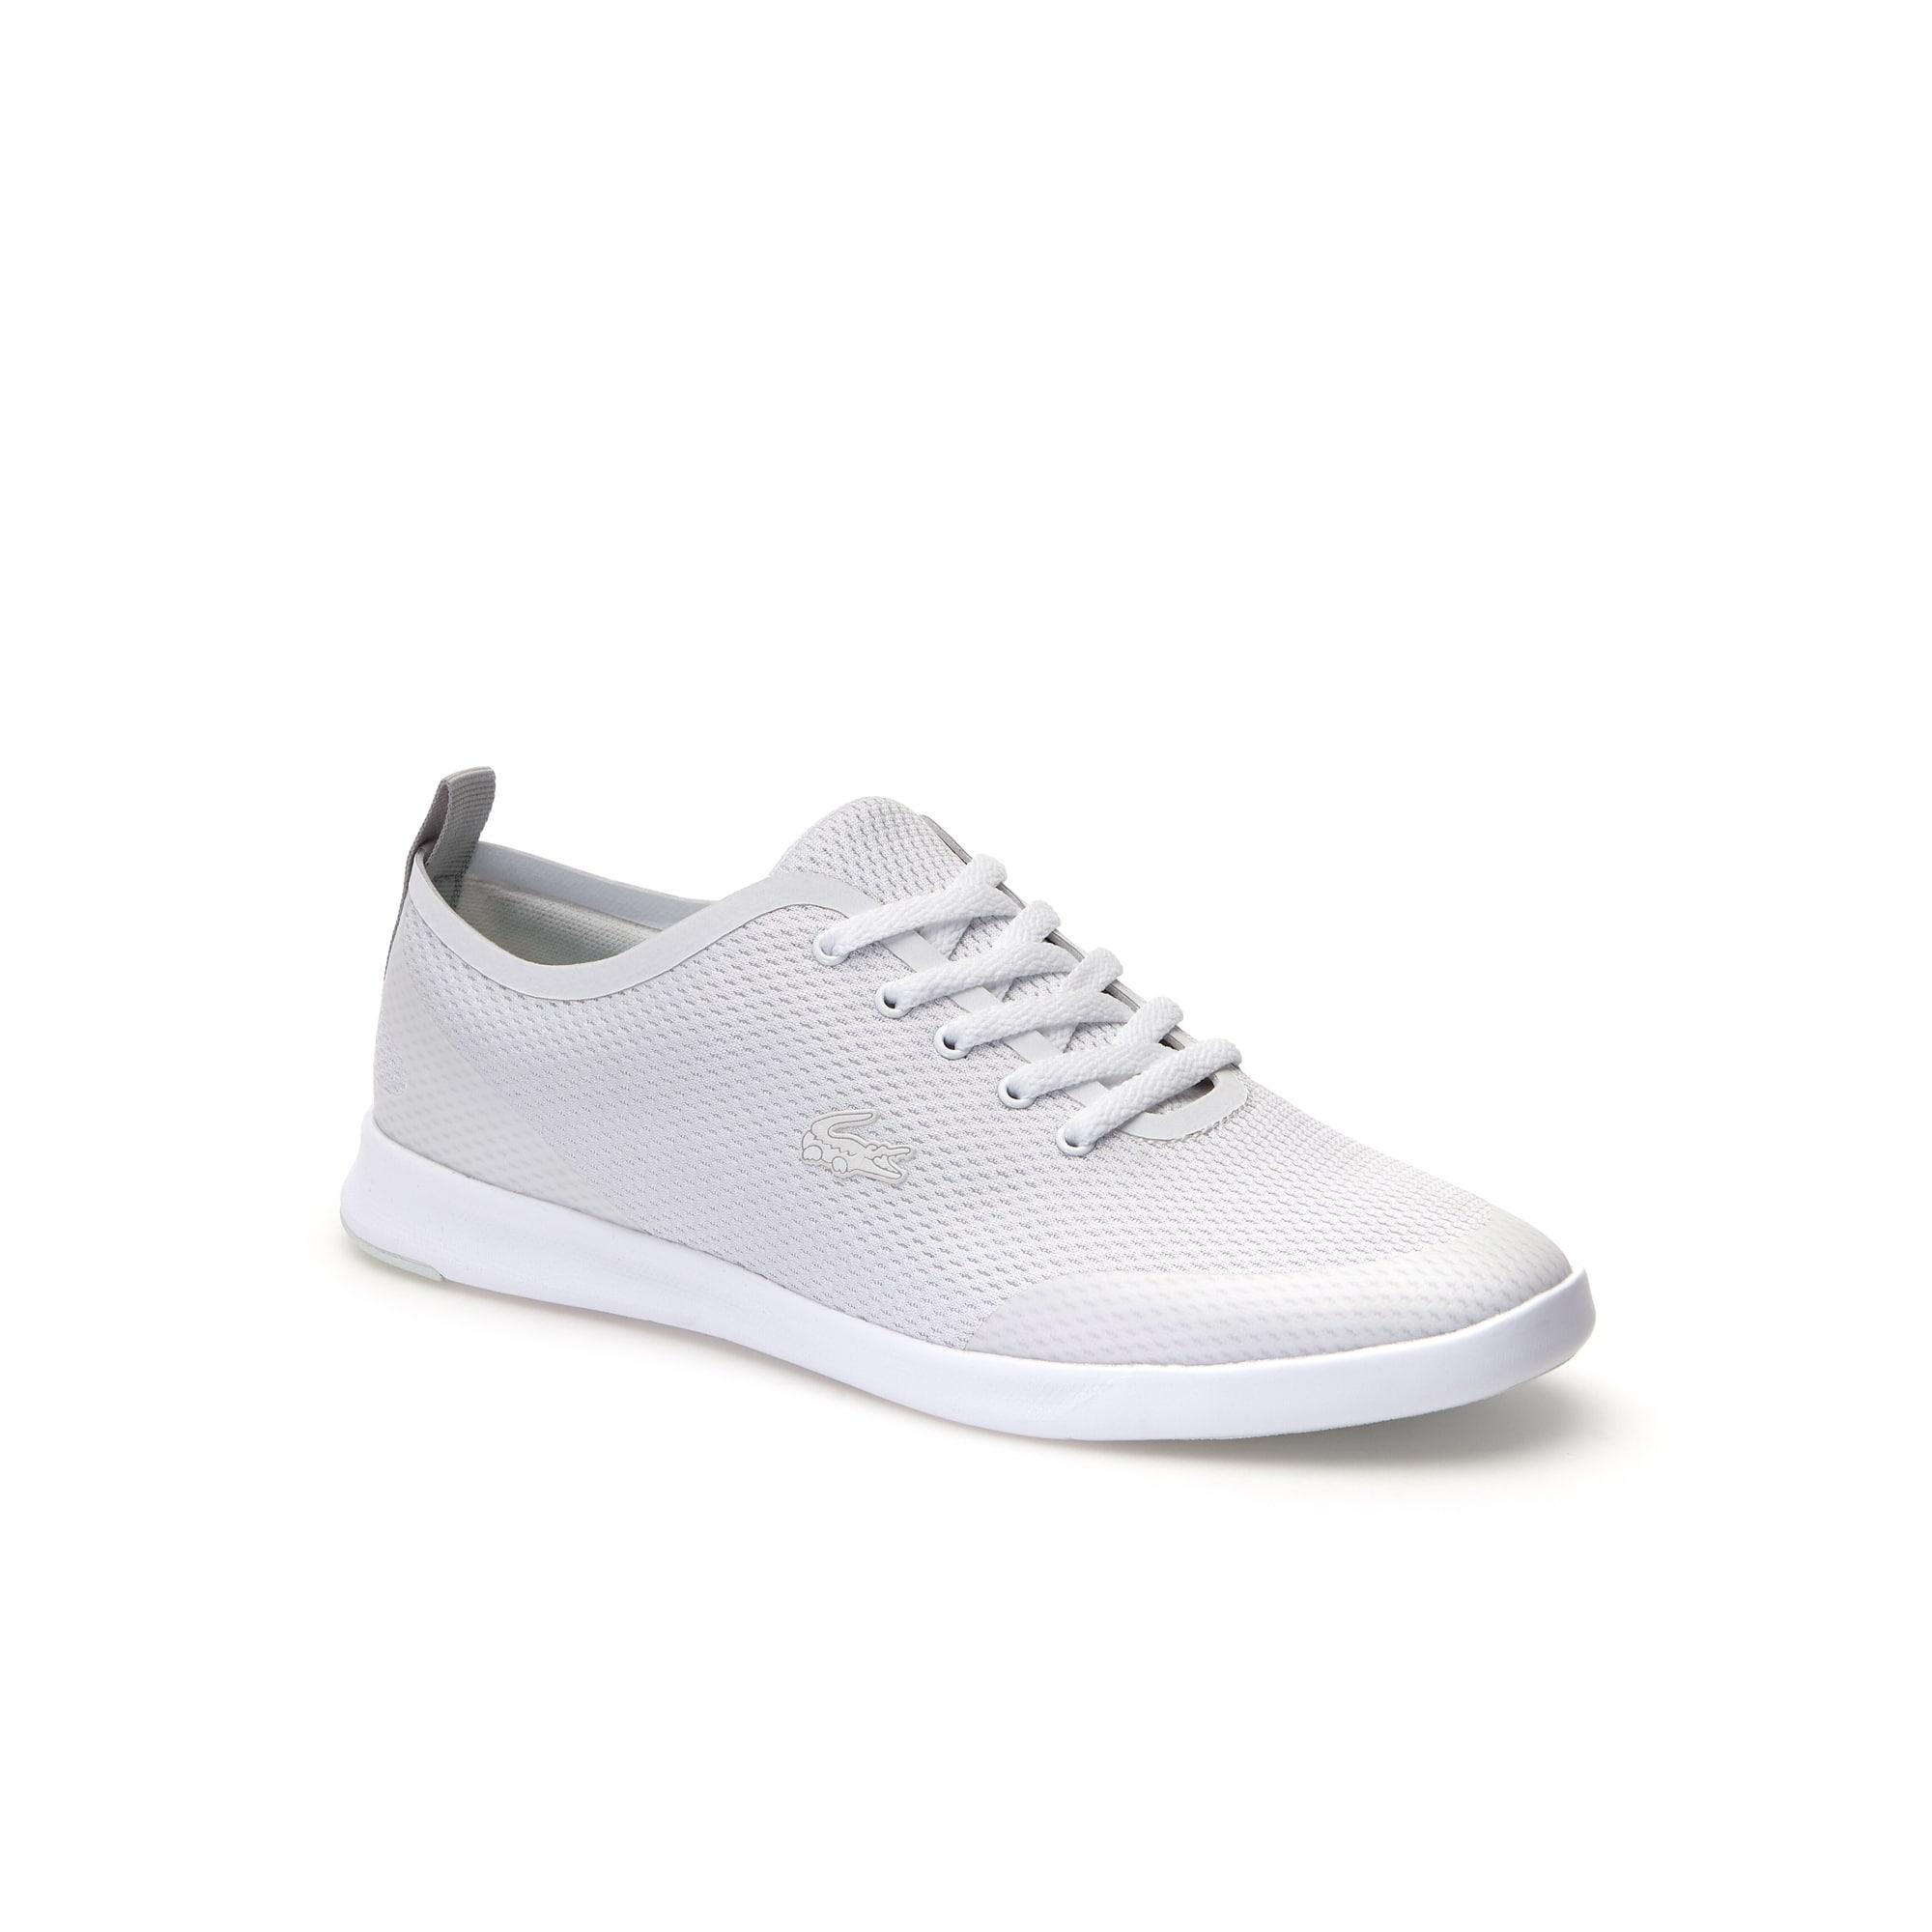 Sneakers Avenir en textile